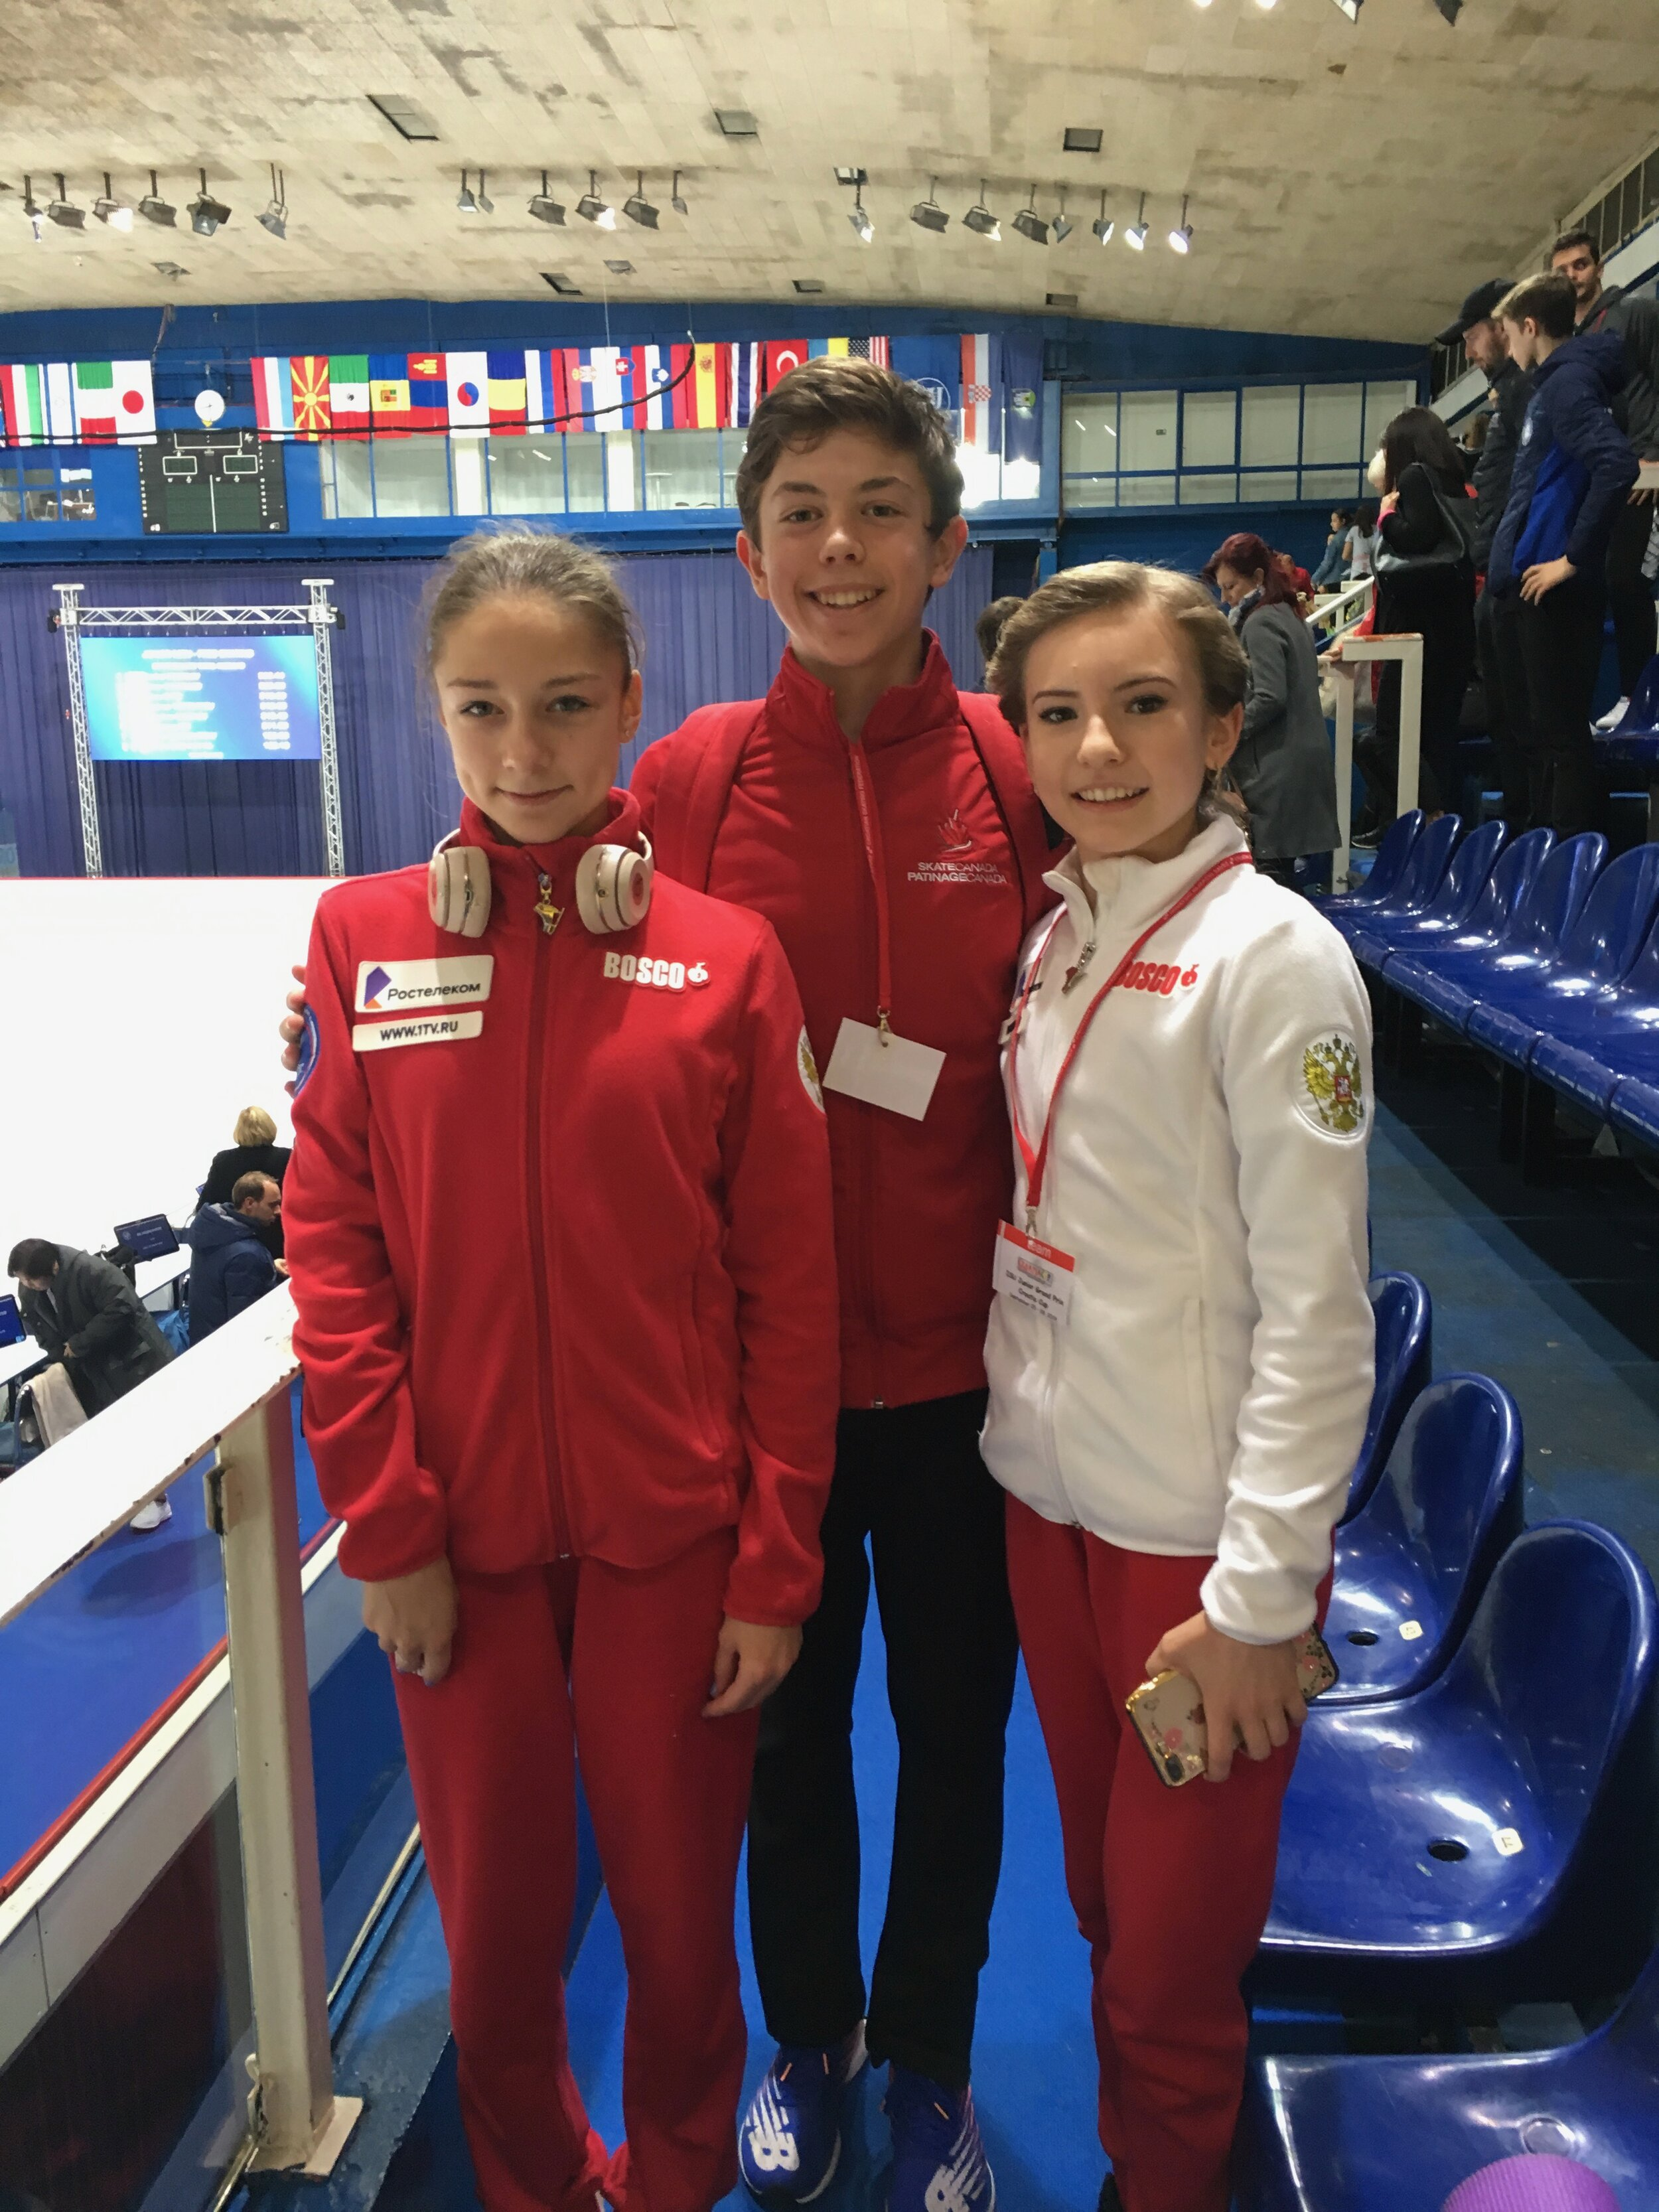 Aleksa after the long program with Russian skaters Daria Usacheva & Anna Frolova